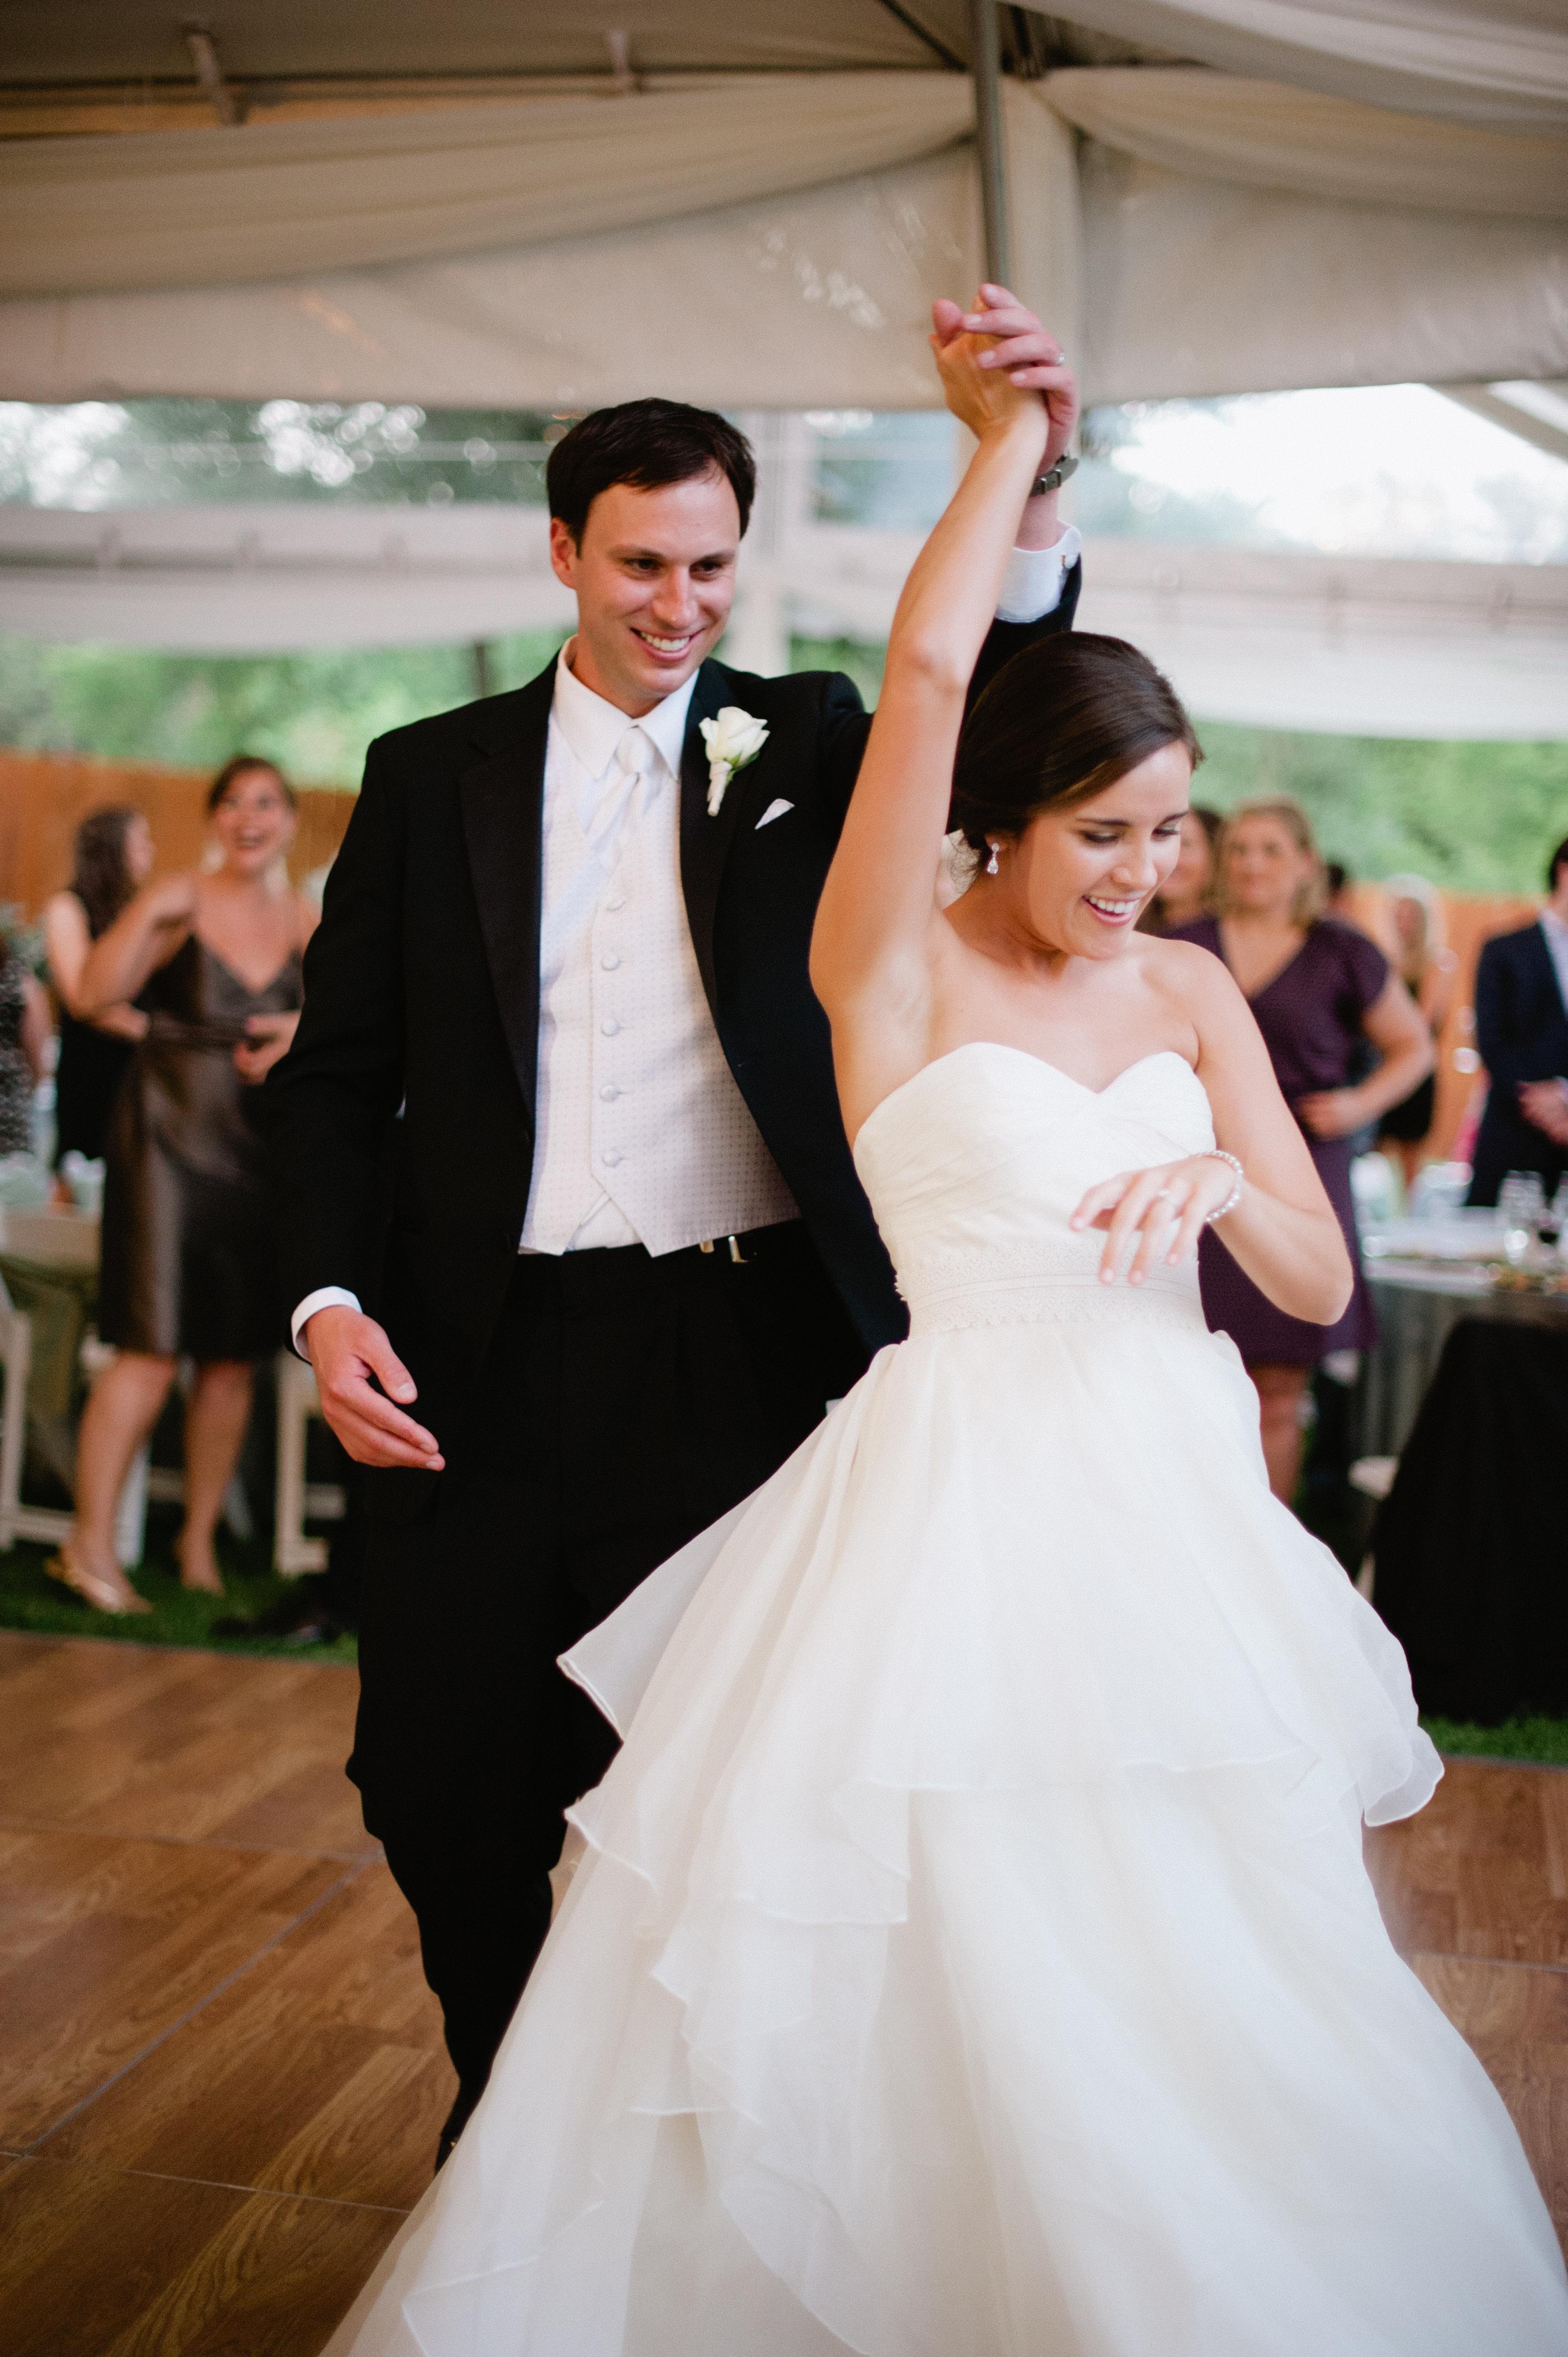 Bride And Groom Outdoor Reception First Dance Ideas Elizabeth Anne Designs The Wedding Blog